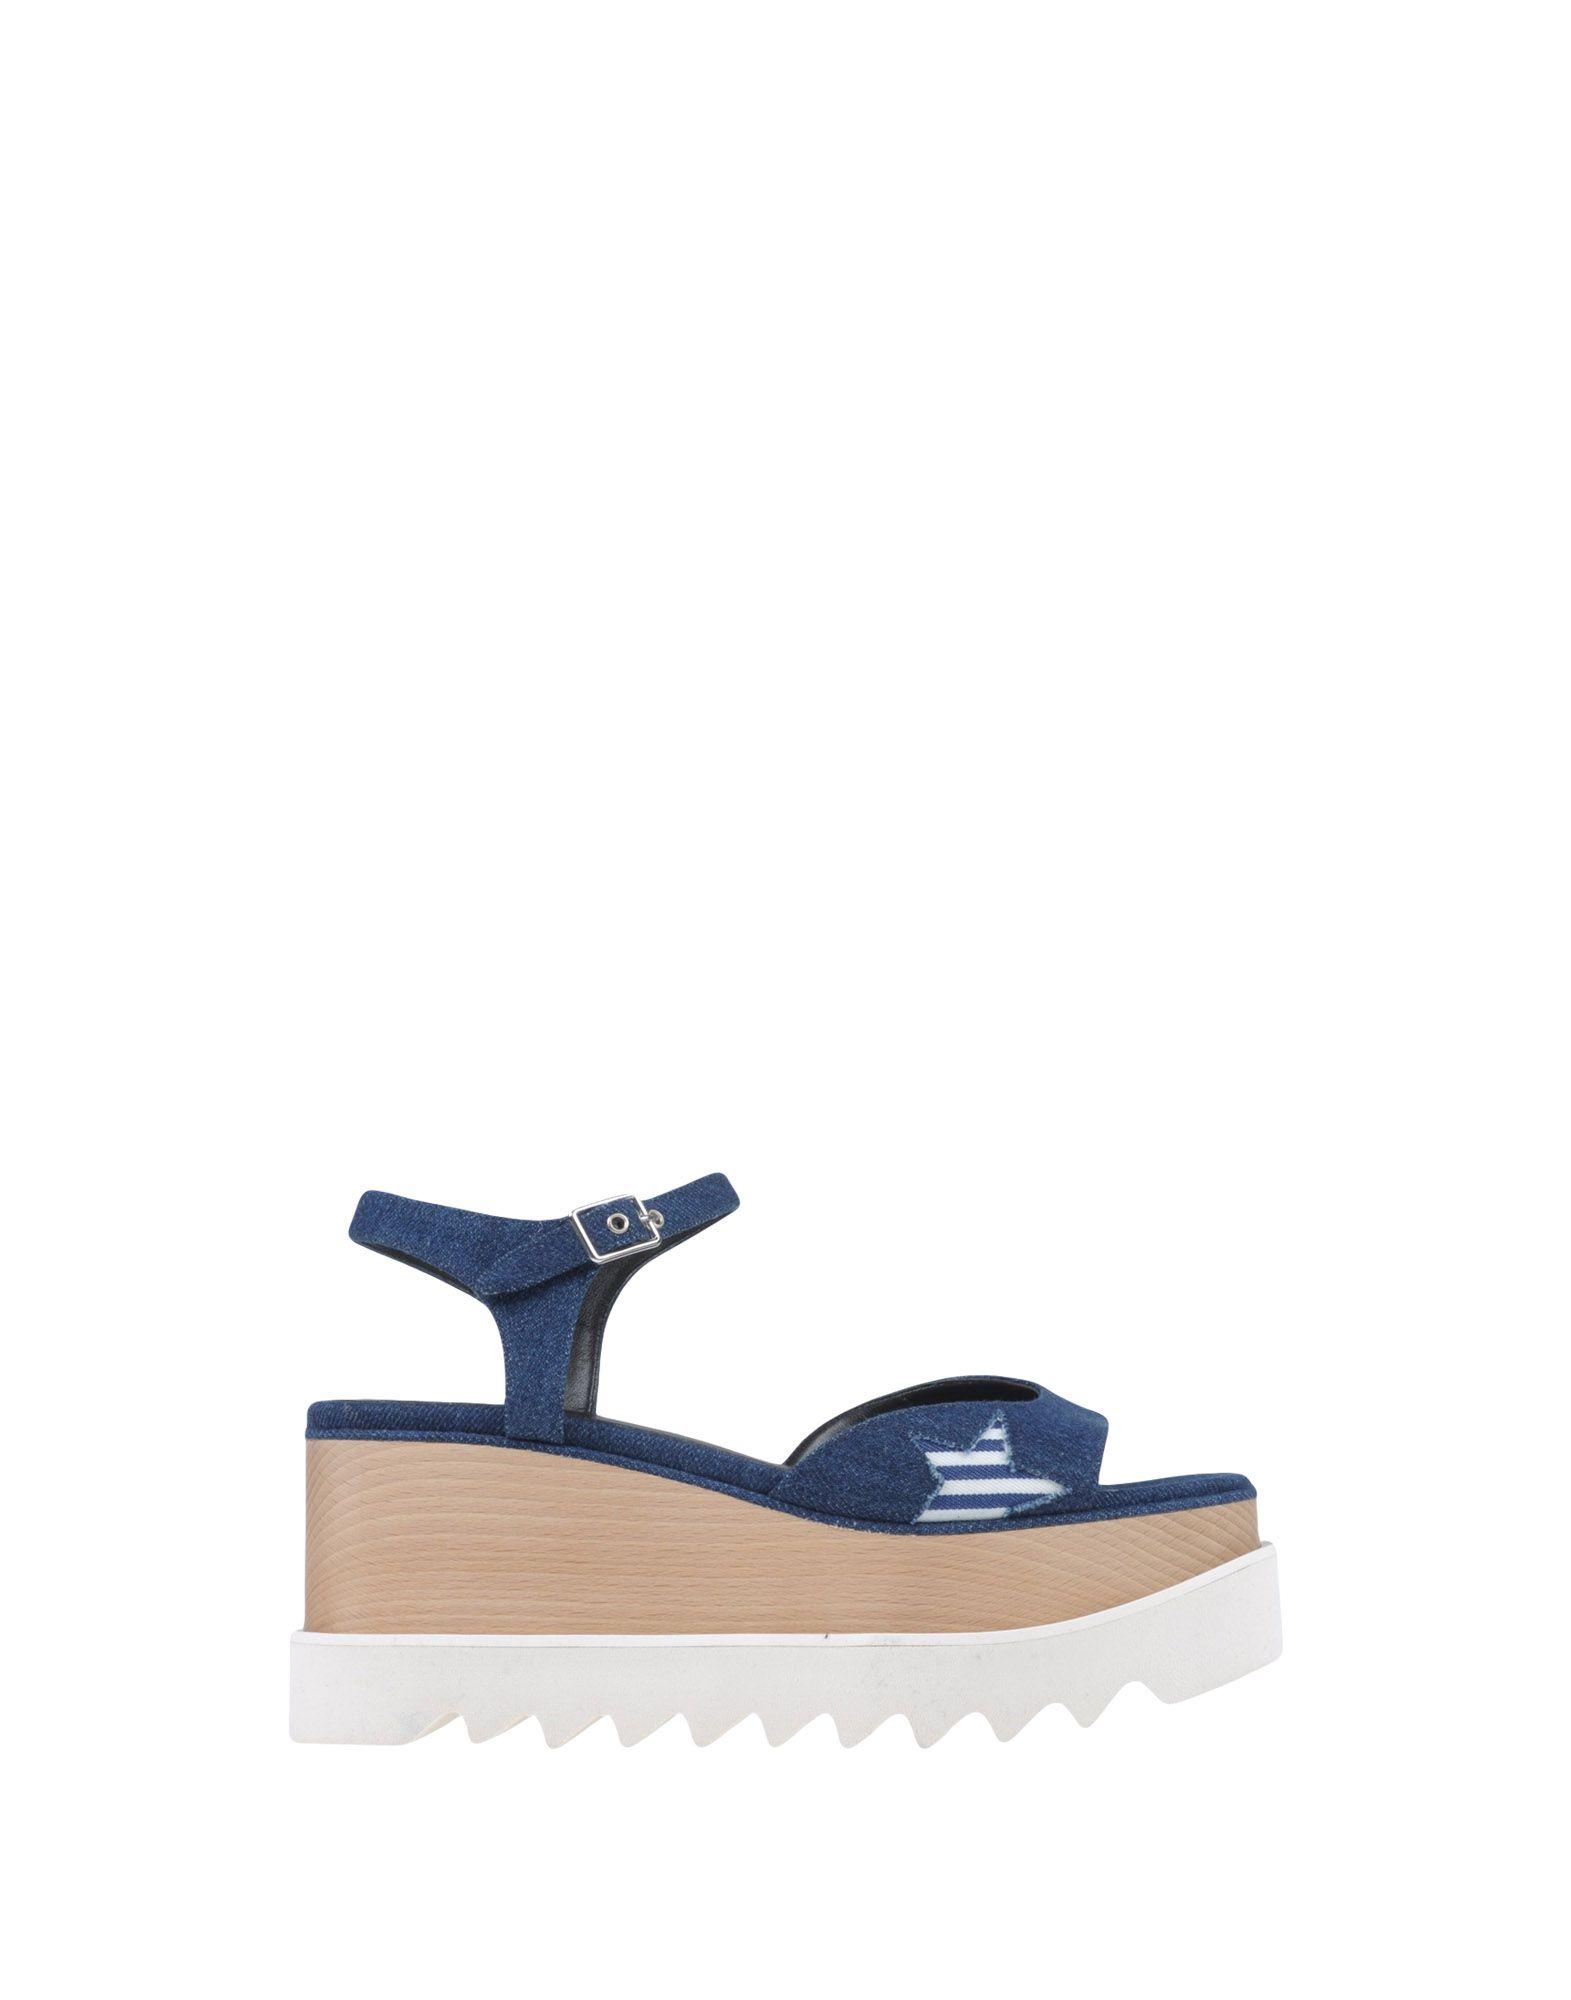 Stella Mccartney Sandalen Damen  11391235XVGünstige gut aussehende Schuhe